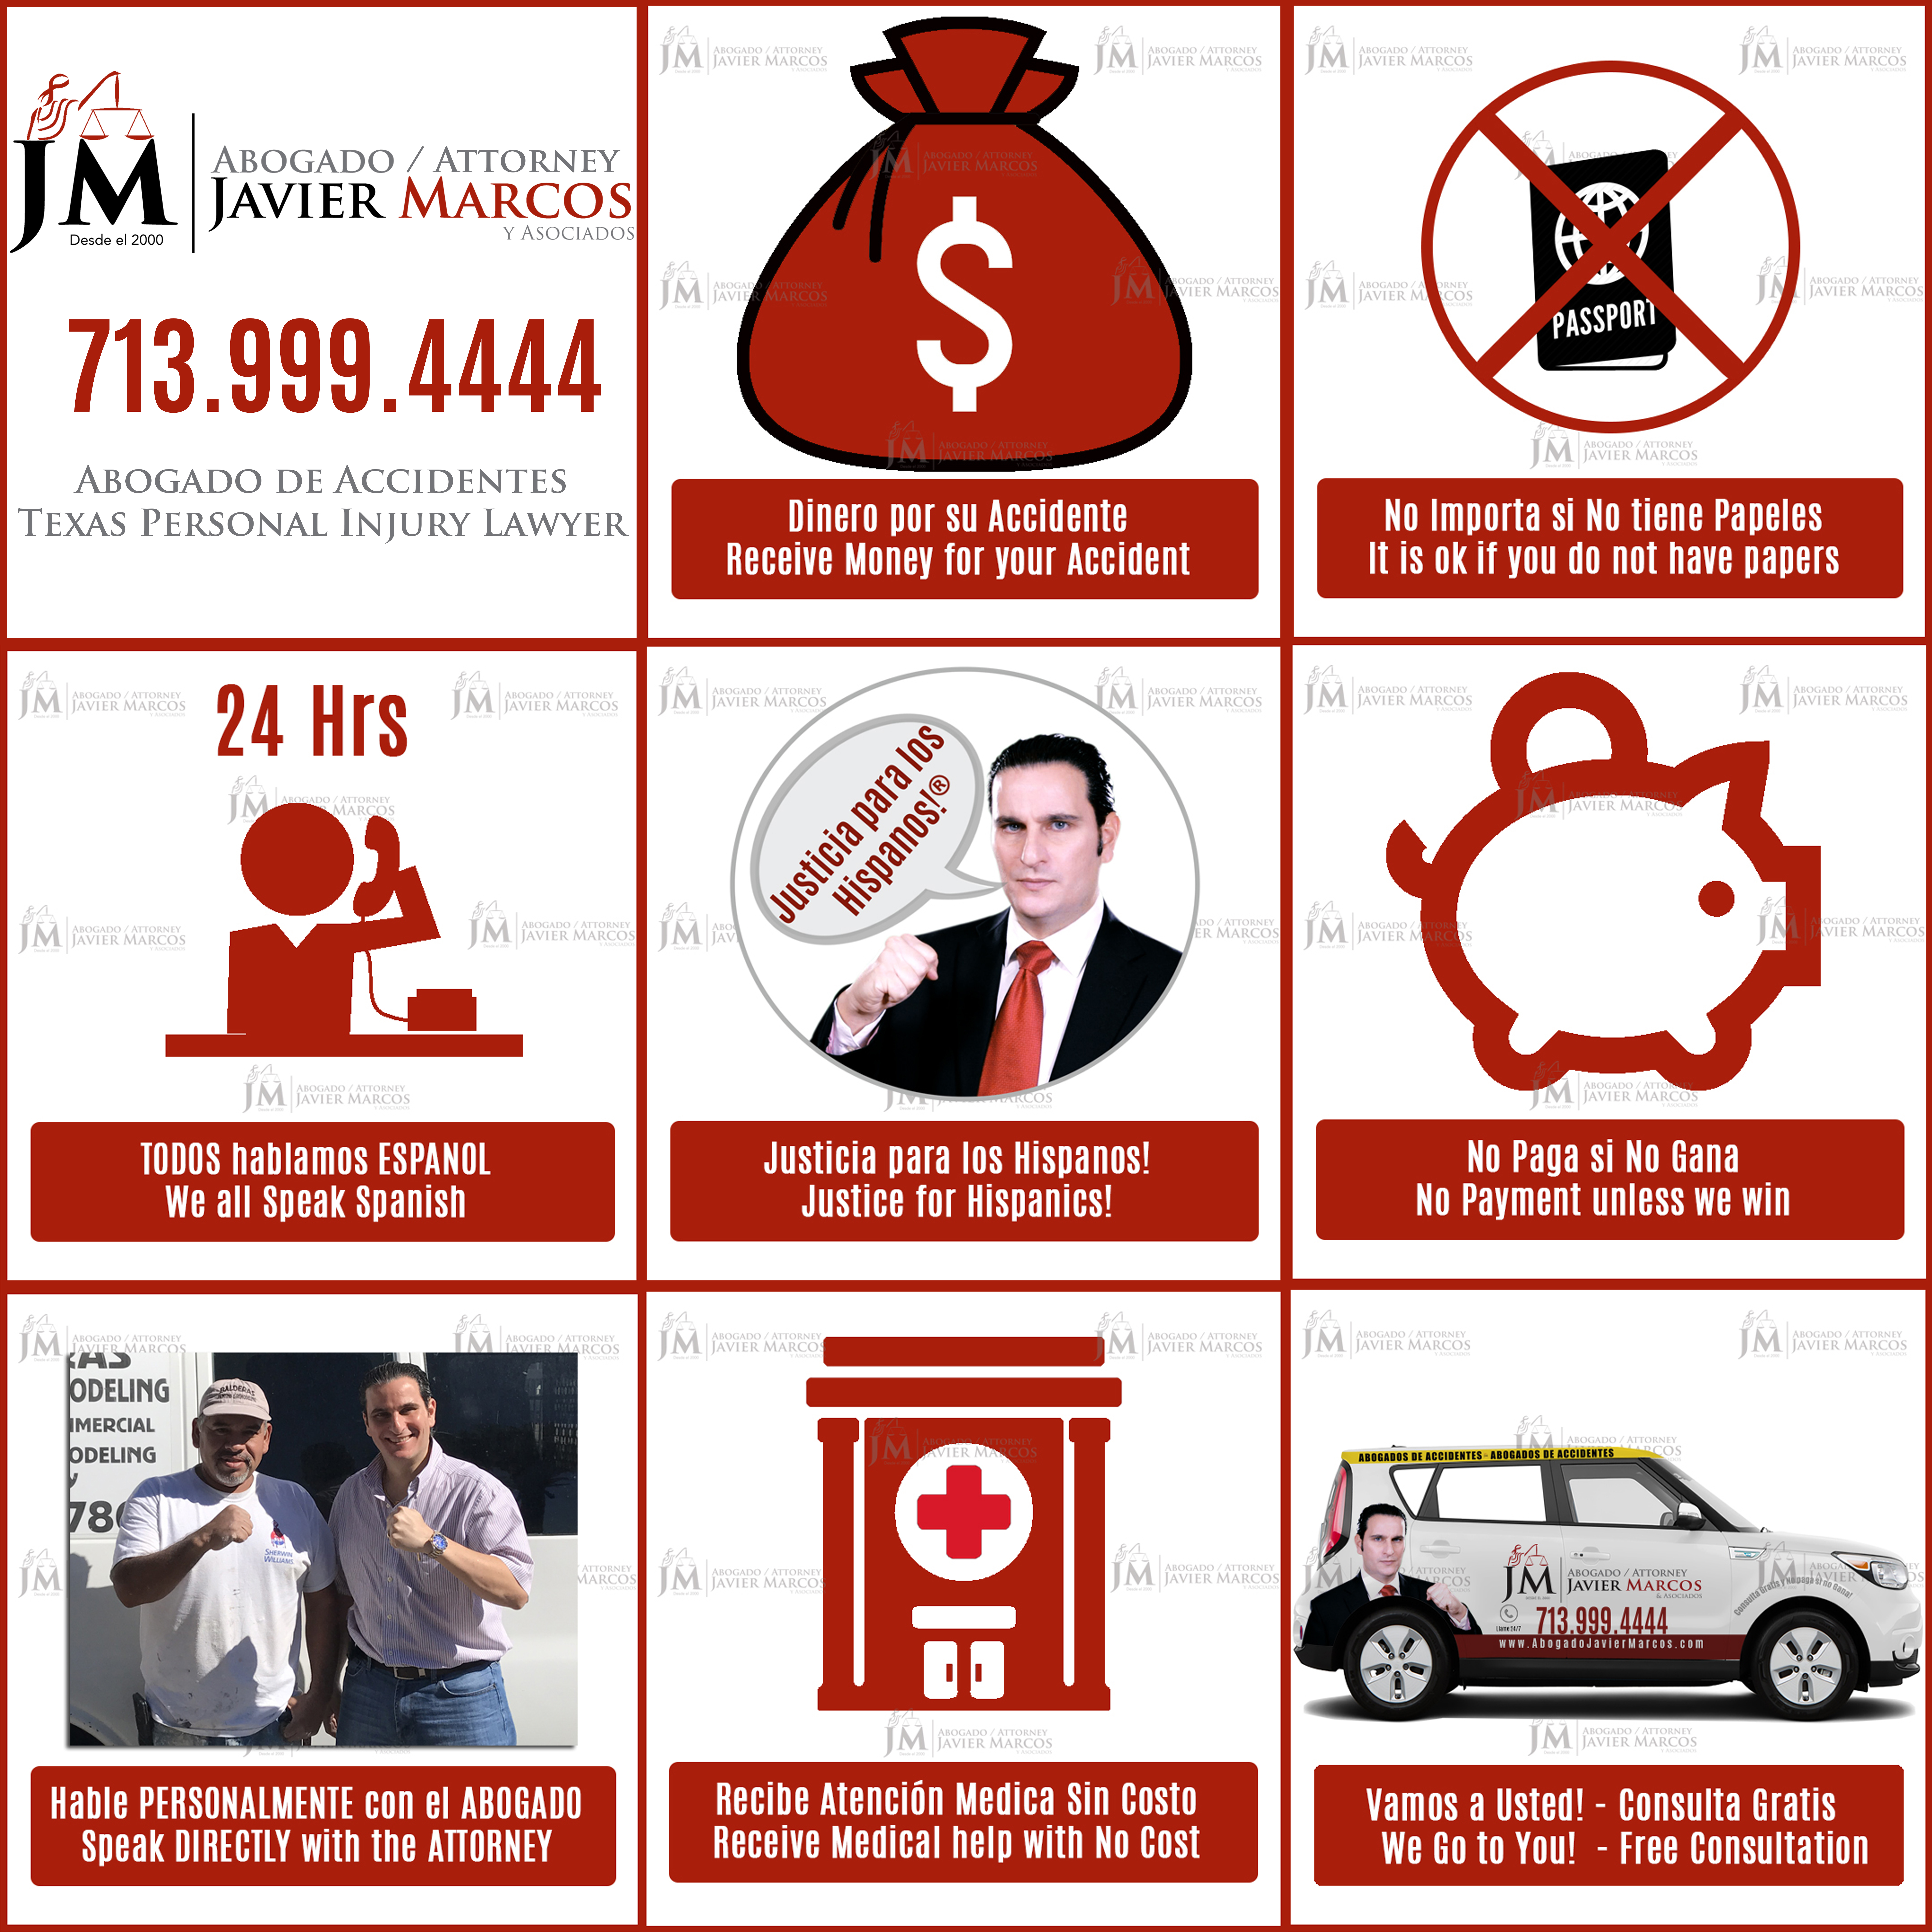 Attorney Javier Marcos | Personal Injury Attorney | 713.999.4444